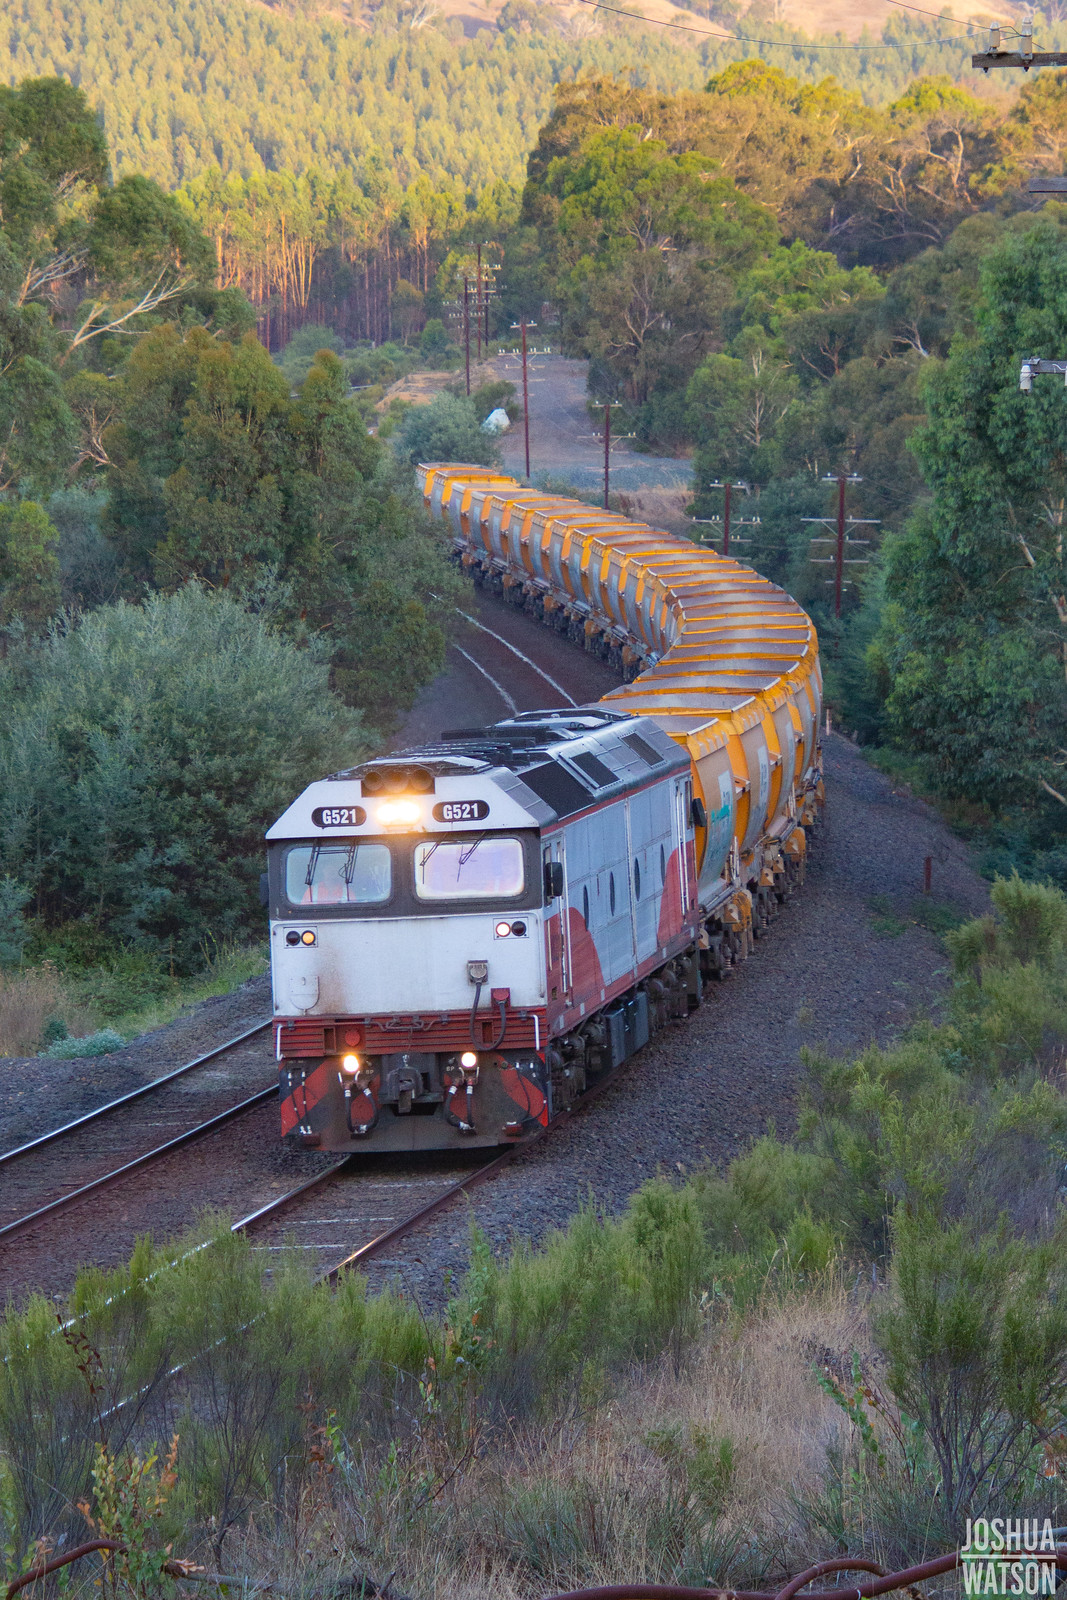 Curving Quarry Train by Joshua_Watson